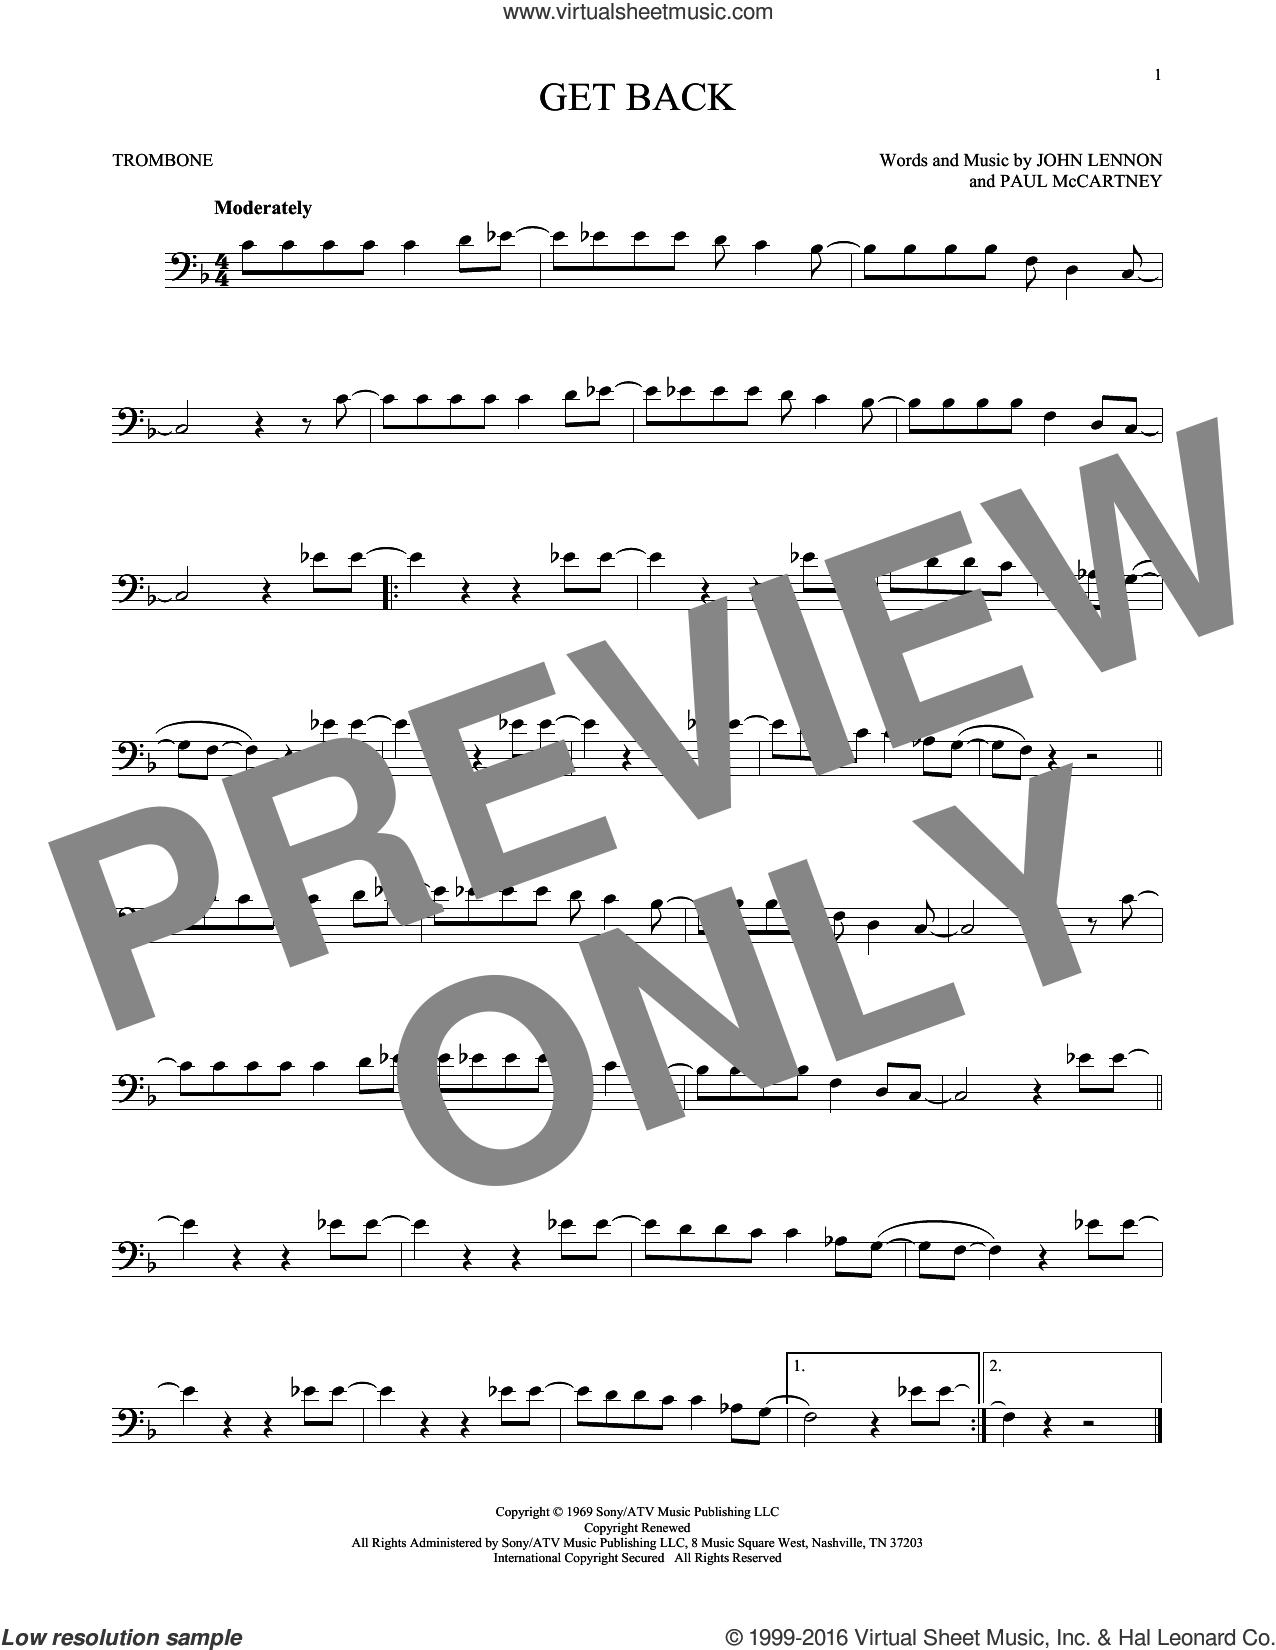 Get Back sheet music for trombone solo by The Beatles, John Lennon and Paul McCartney, intermediate skill level